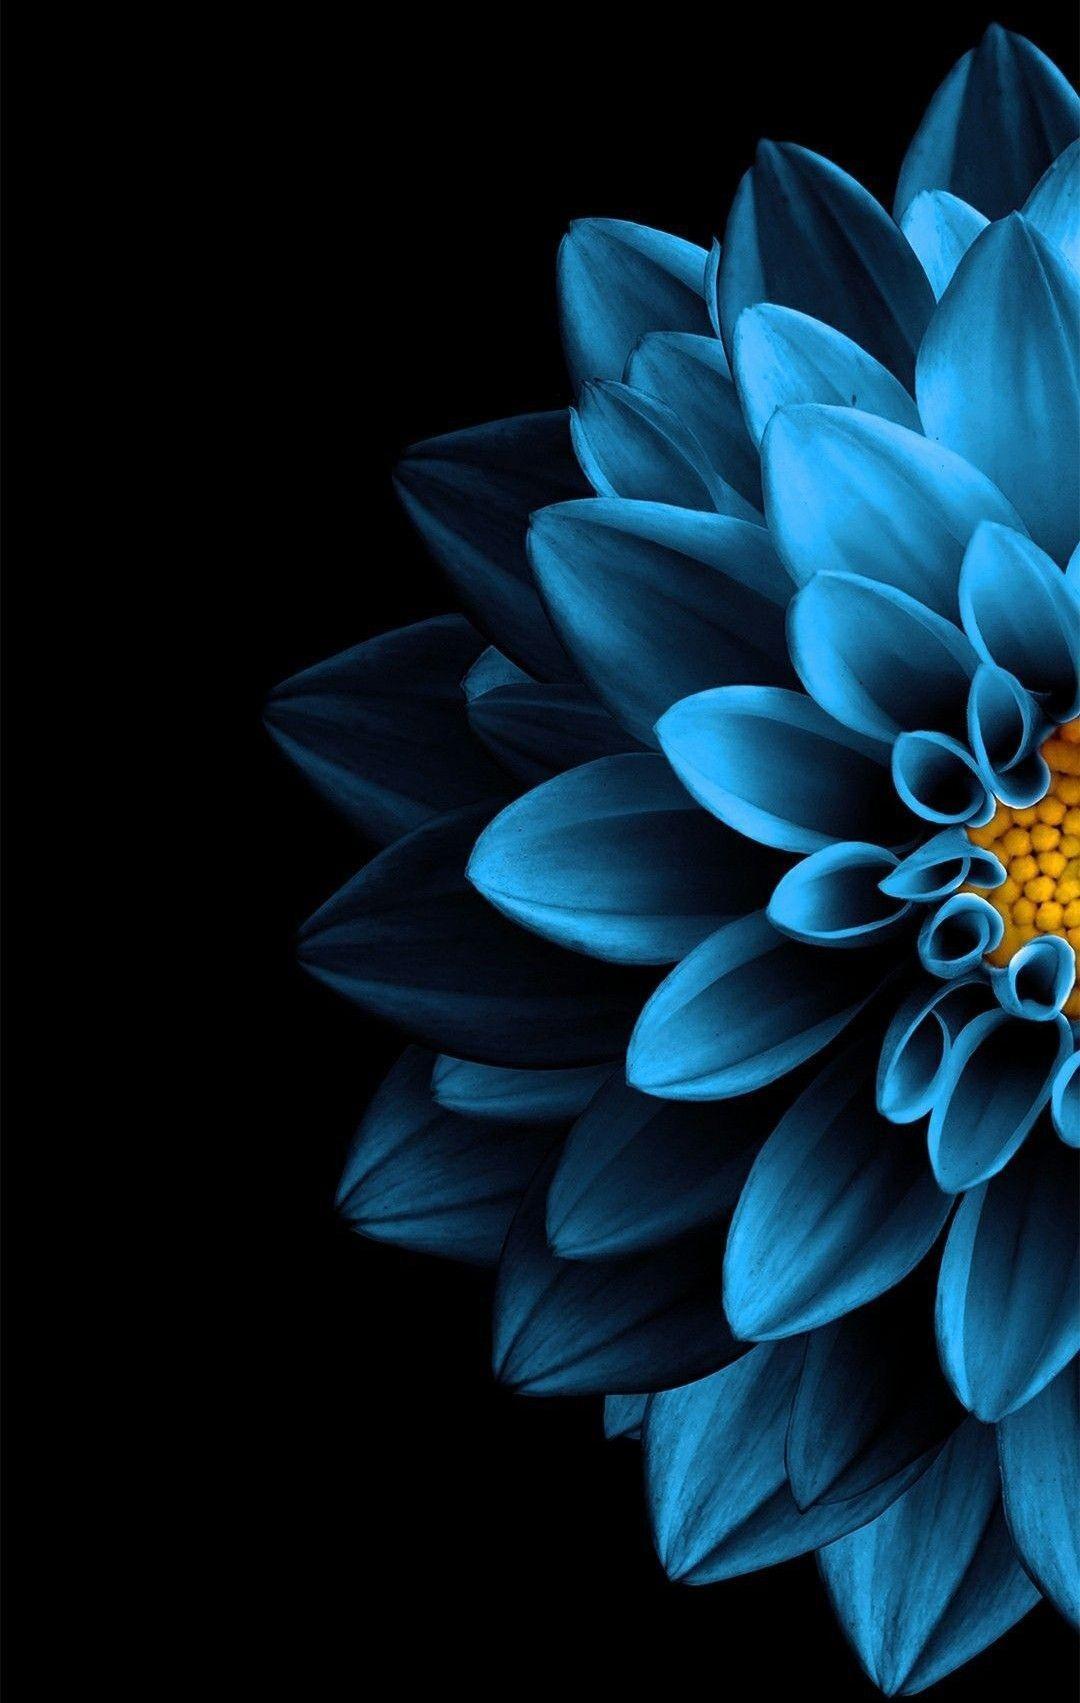 Blue Flowers Phone Wallpapers Top Free Blue Flowers Phone